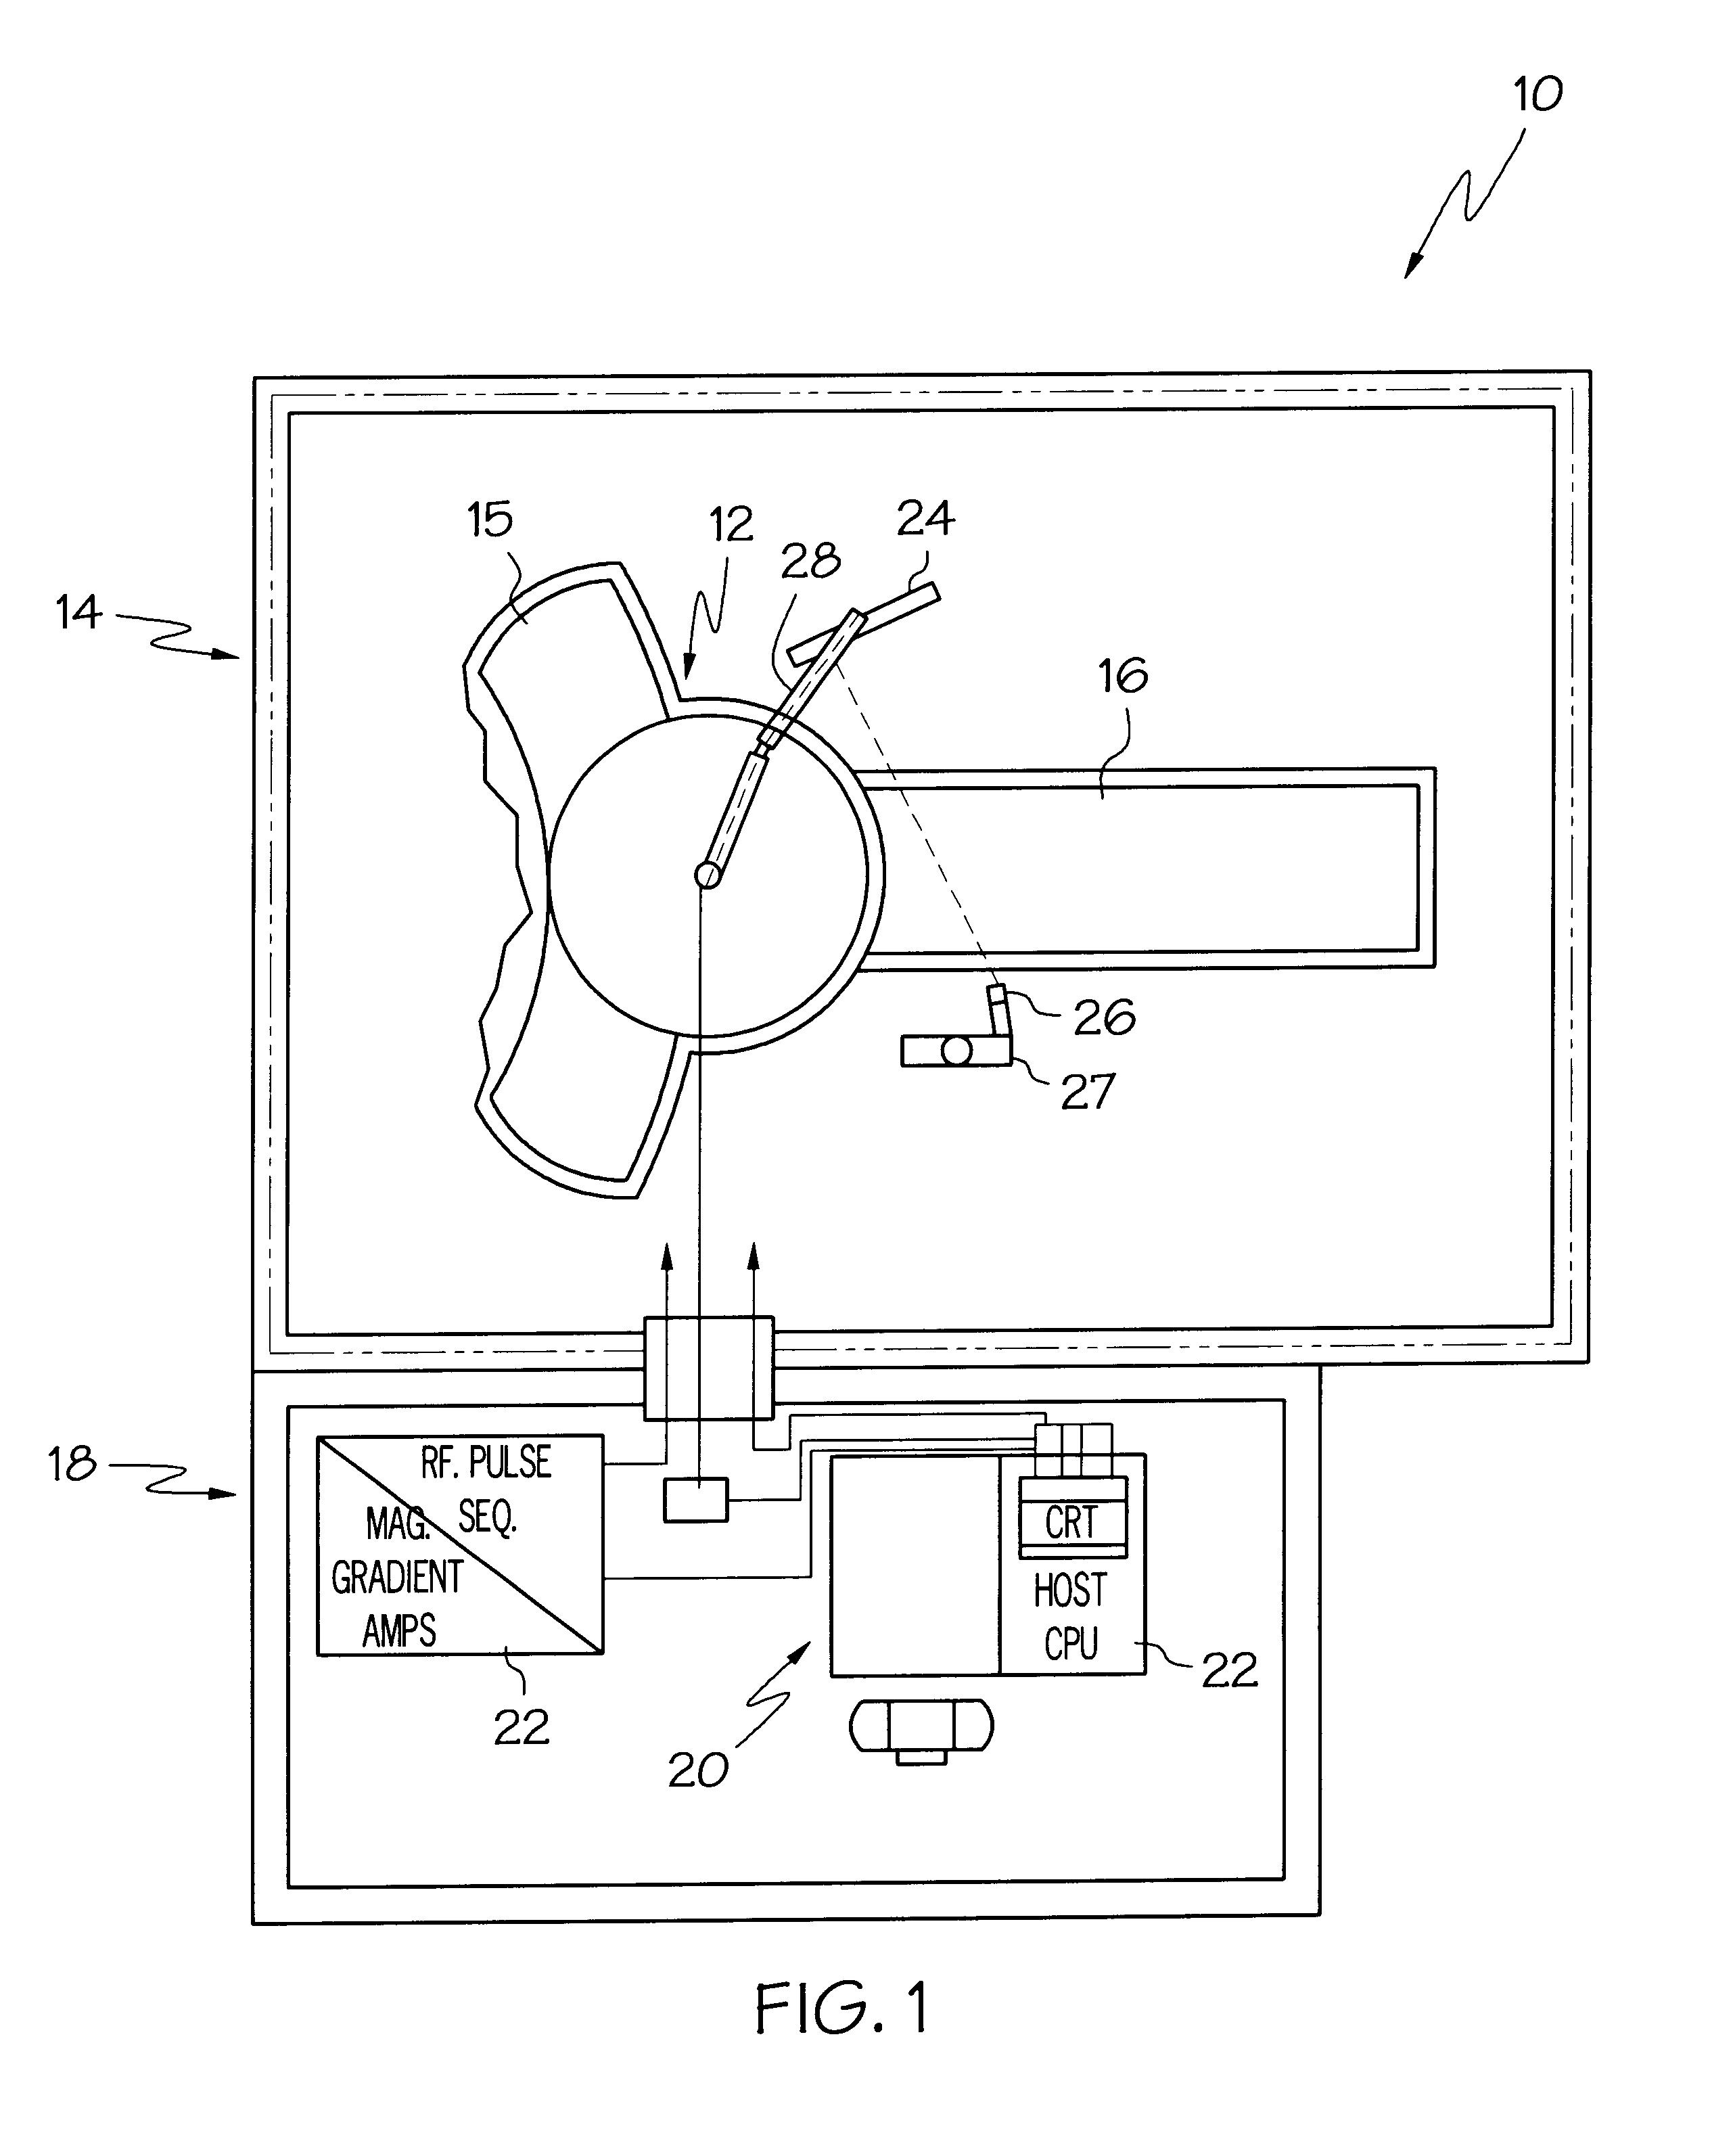 Mack Ecm Wiring Diagram - Wiring Diagram